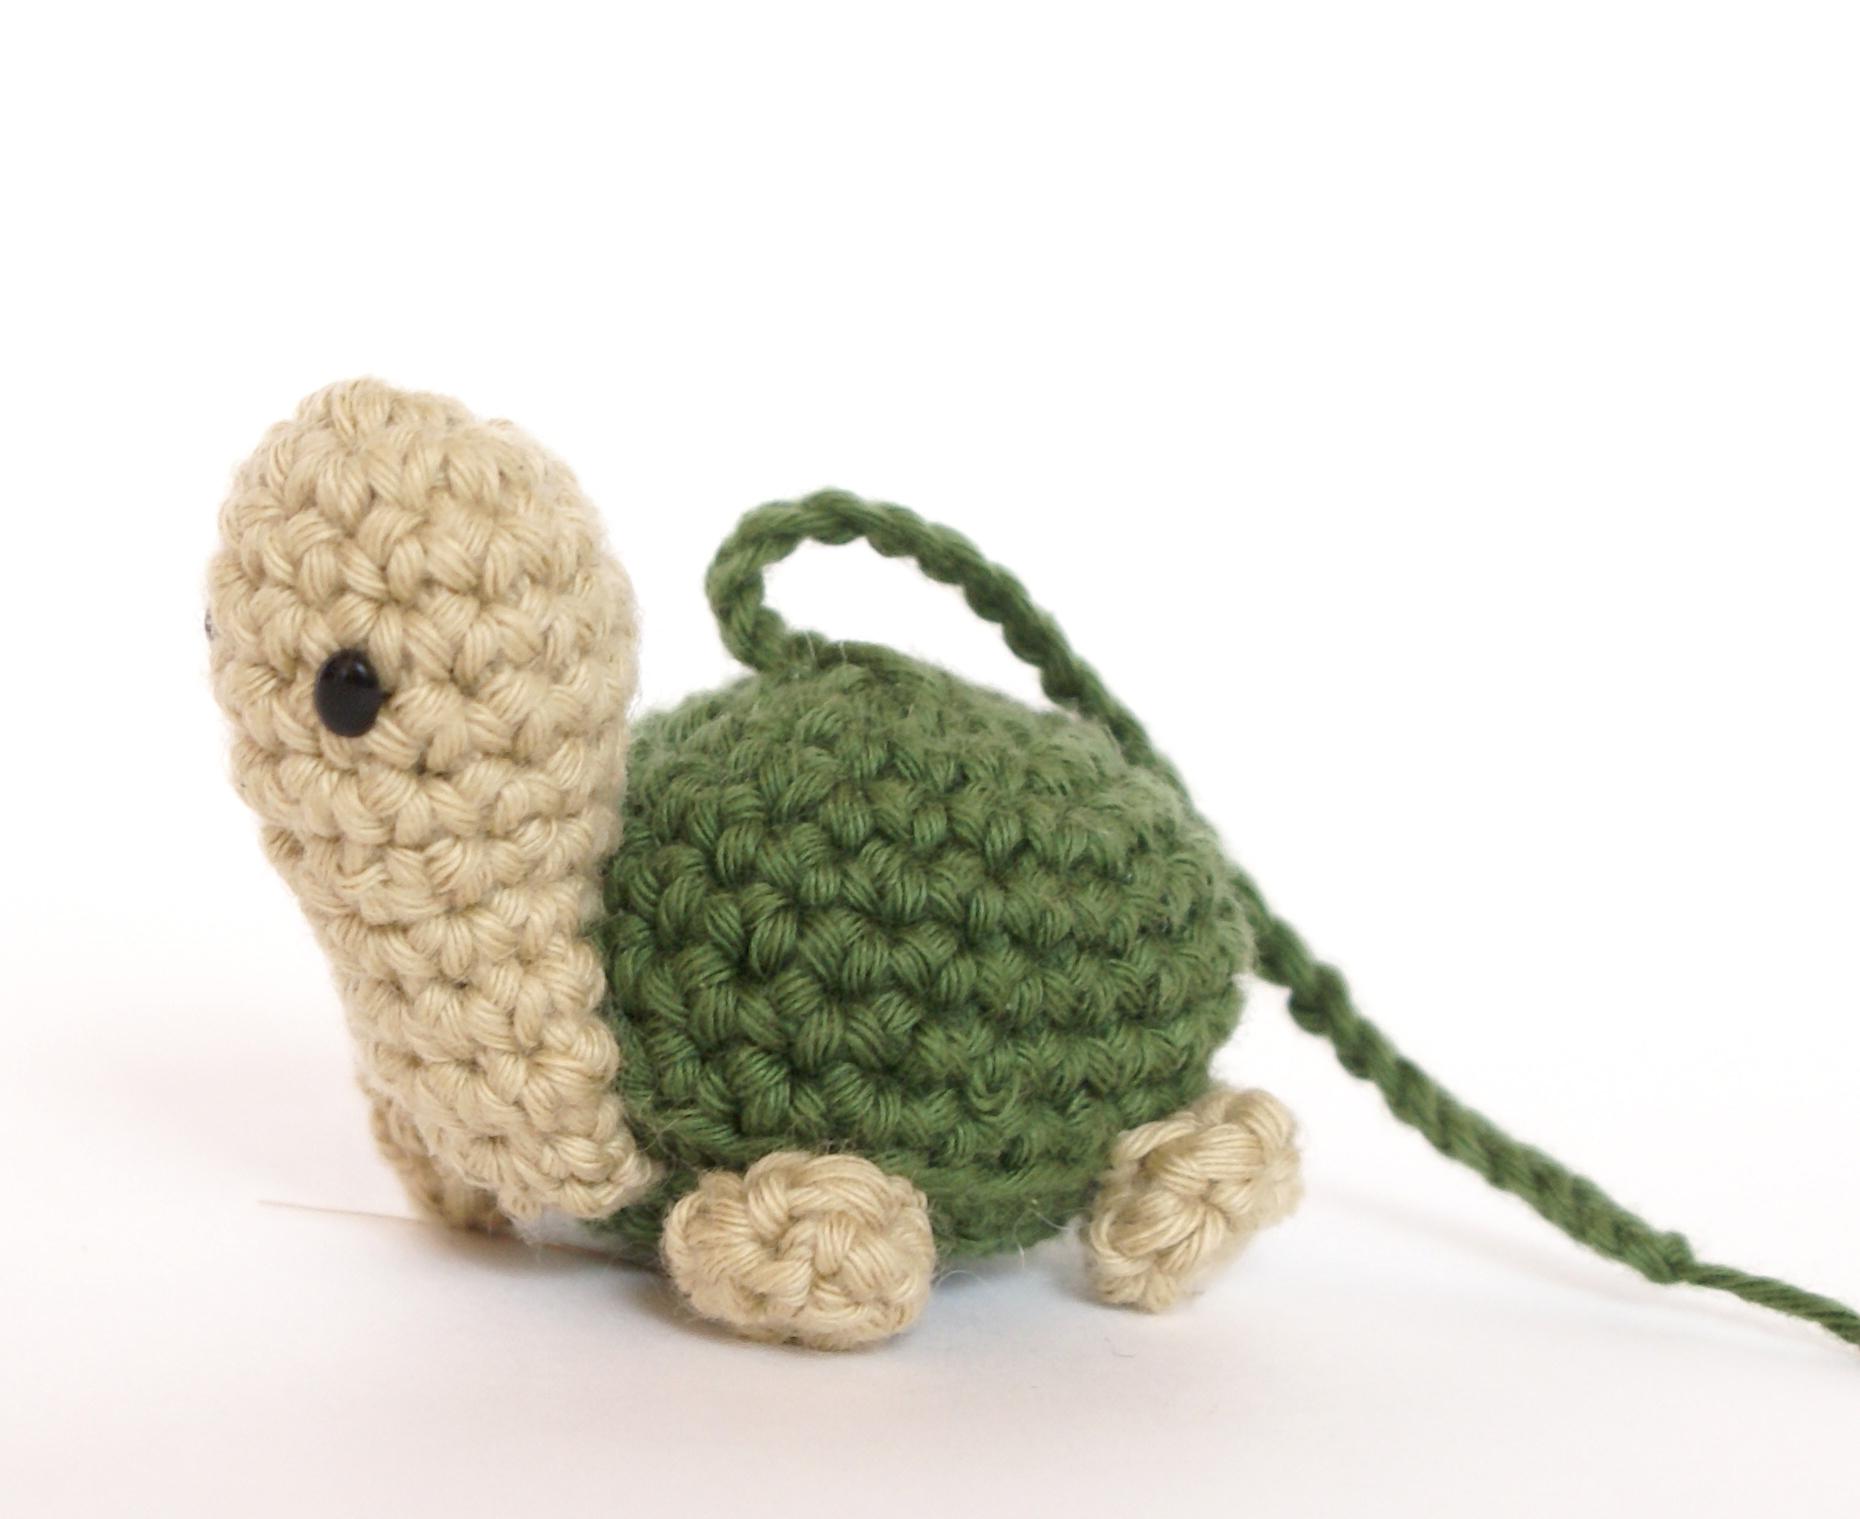 turtle tortoise amigurumi crochet free pattern with video tutorial